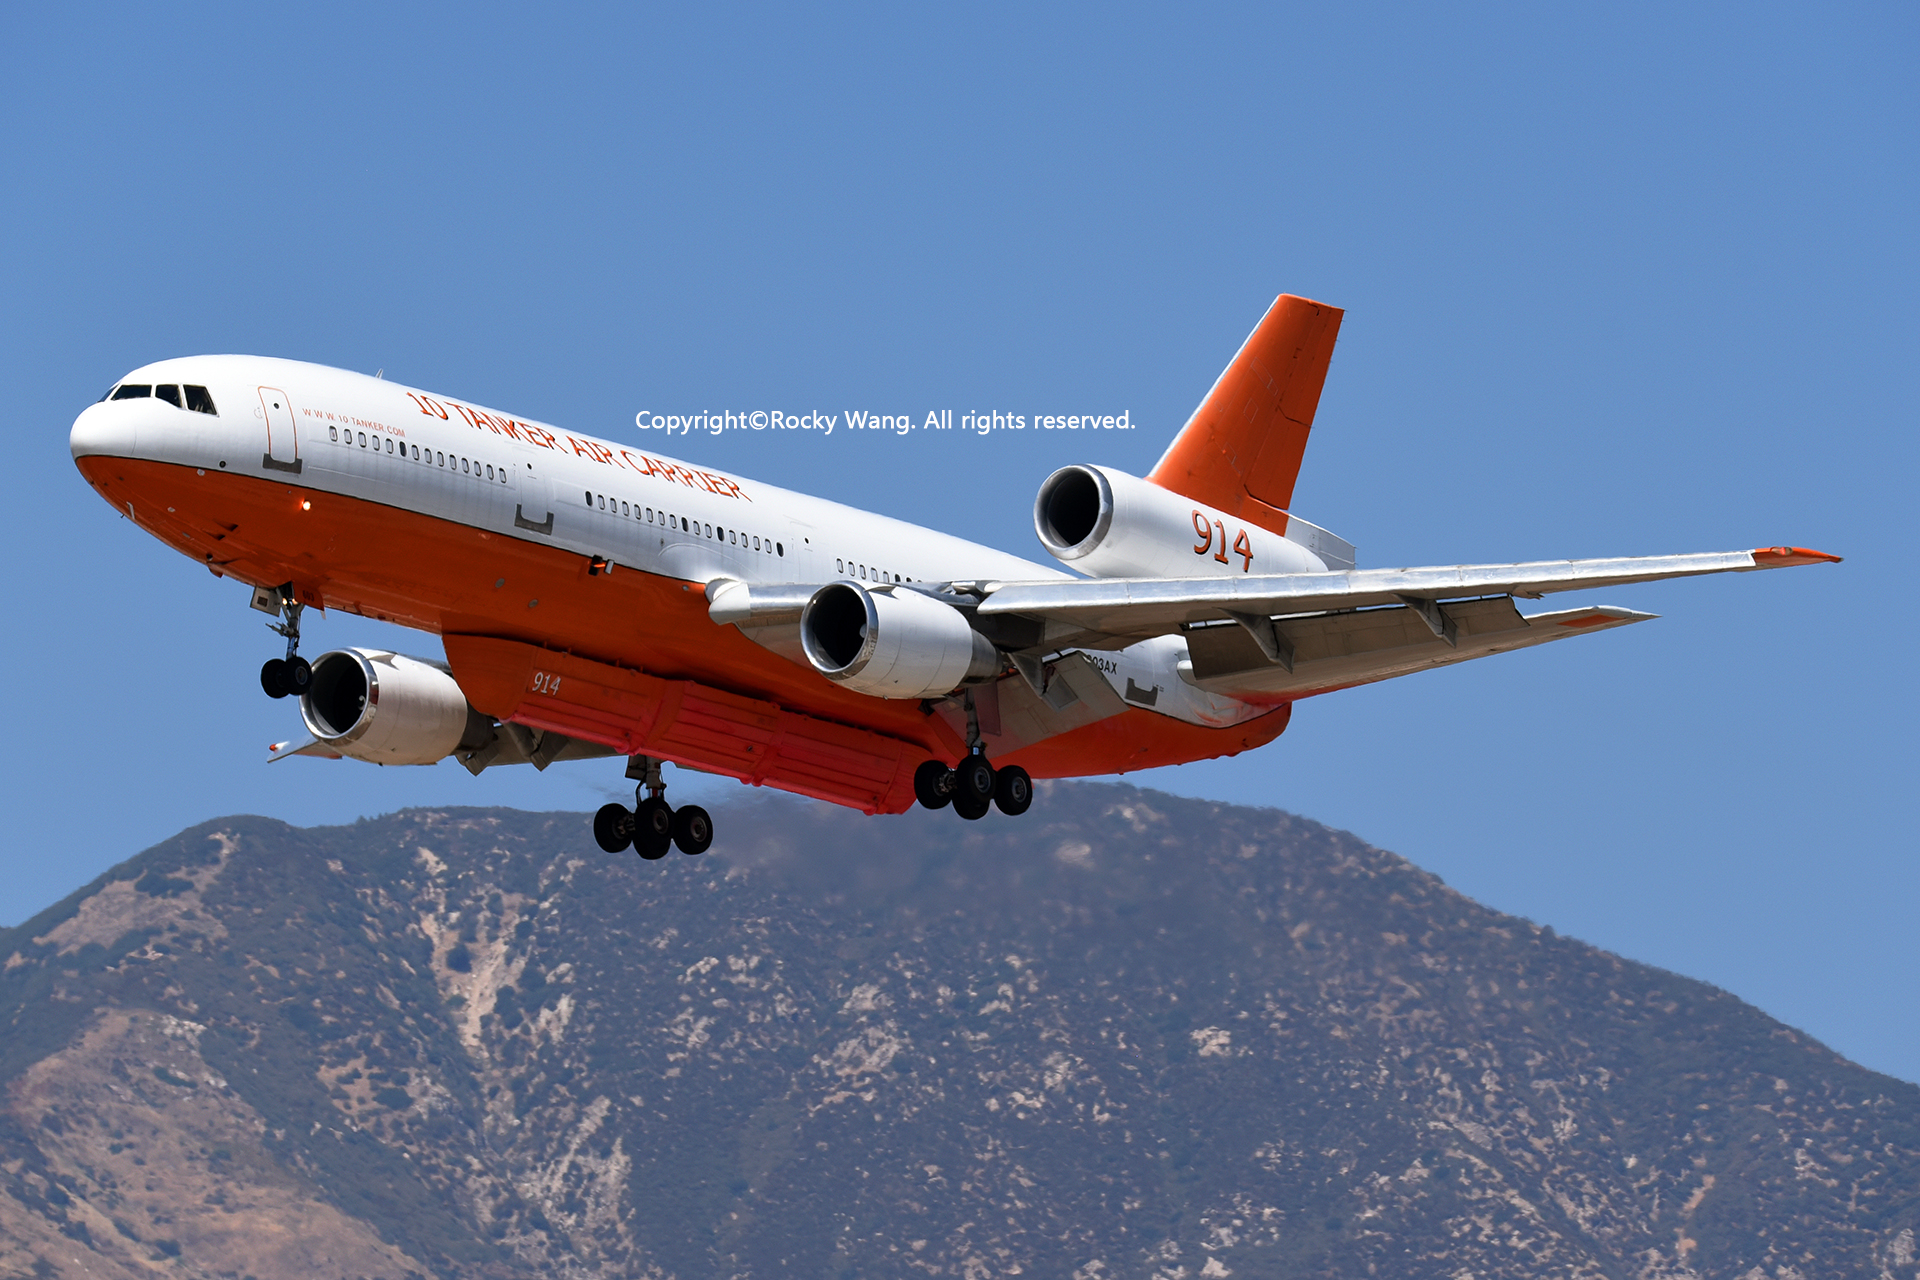 Re:[原创]沙漠29图+彩蛋 MCDONNELL DOUGLAS DC-10-30(ER) N603AX San Bernardino Int'l